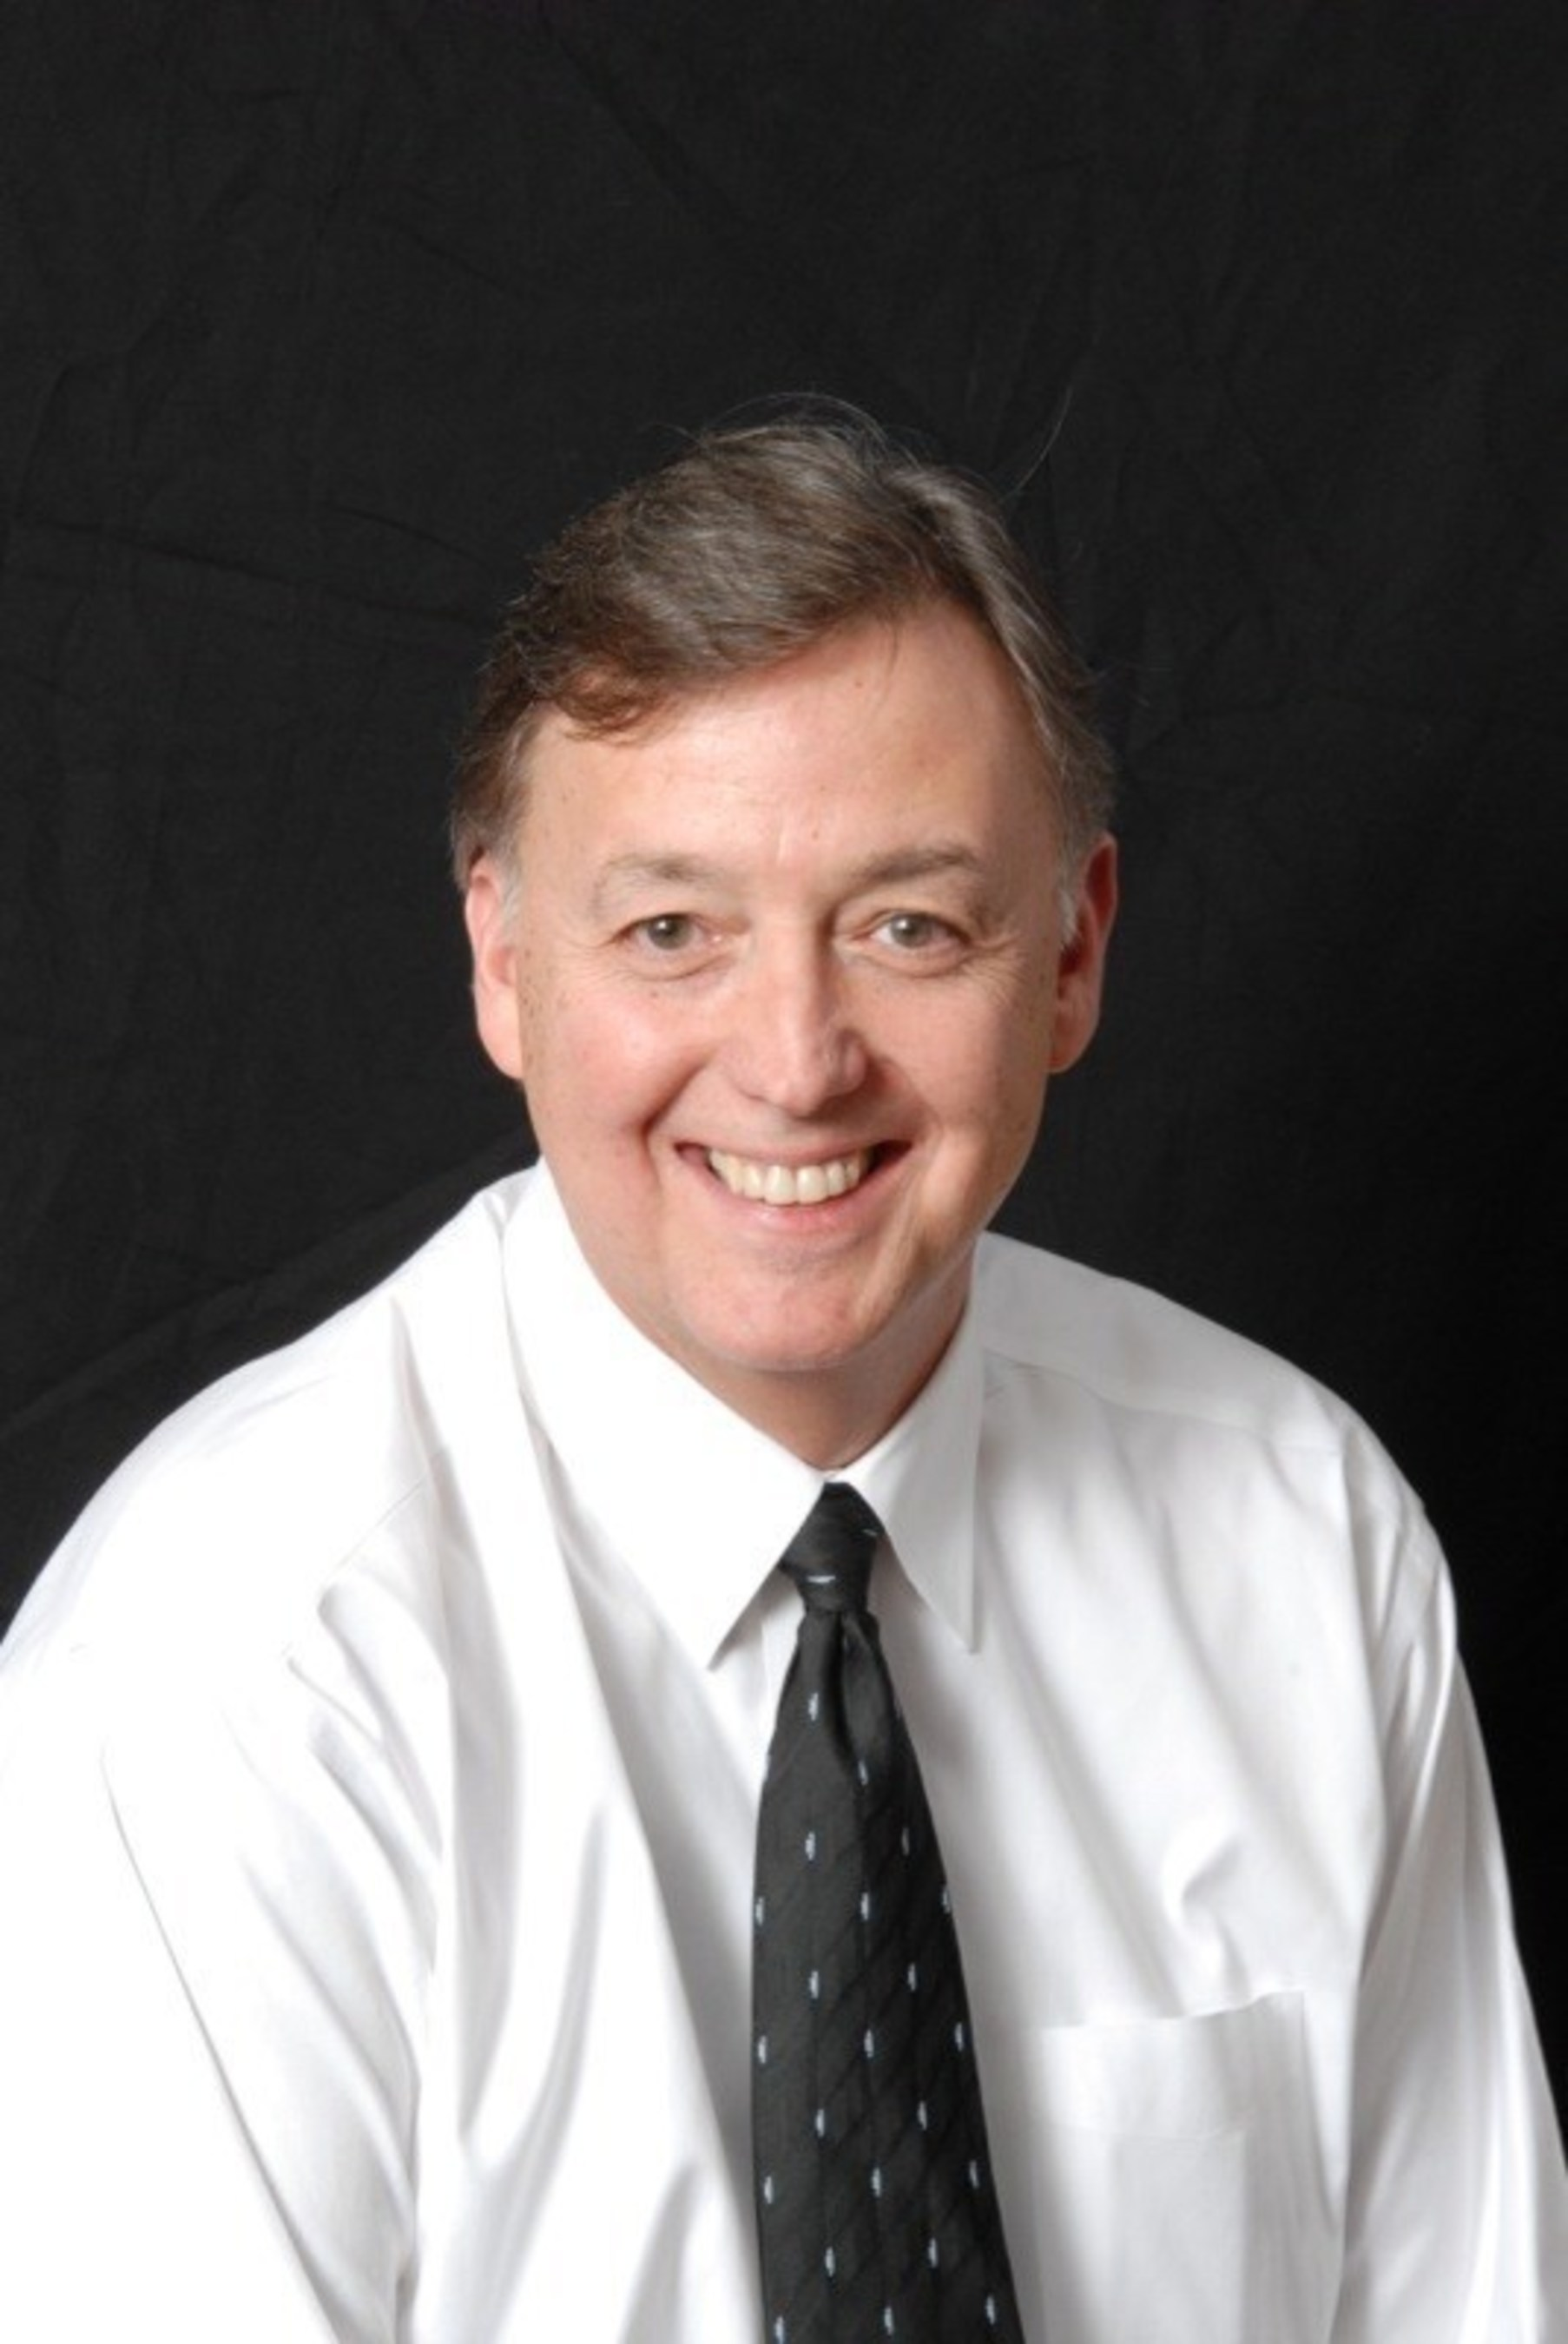 Randy Bush Named General Manager of Salem Media Group's Stations in Little Rock